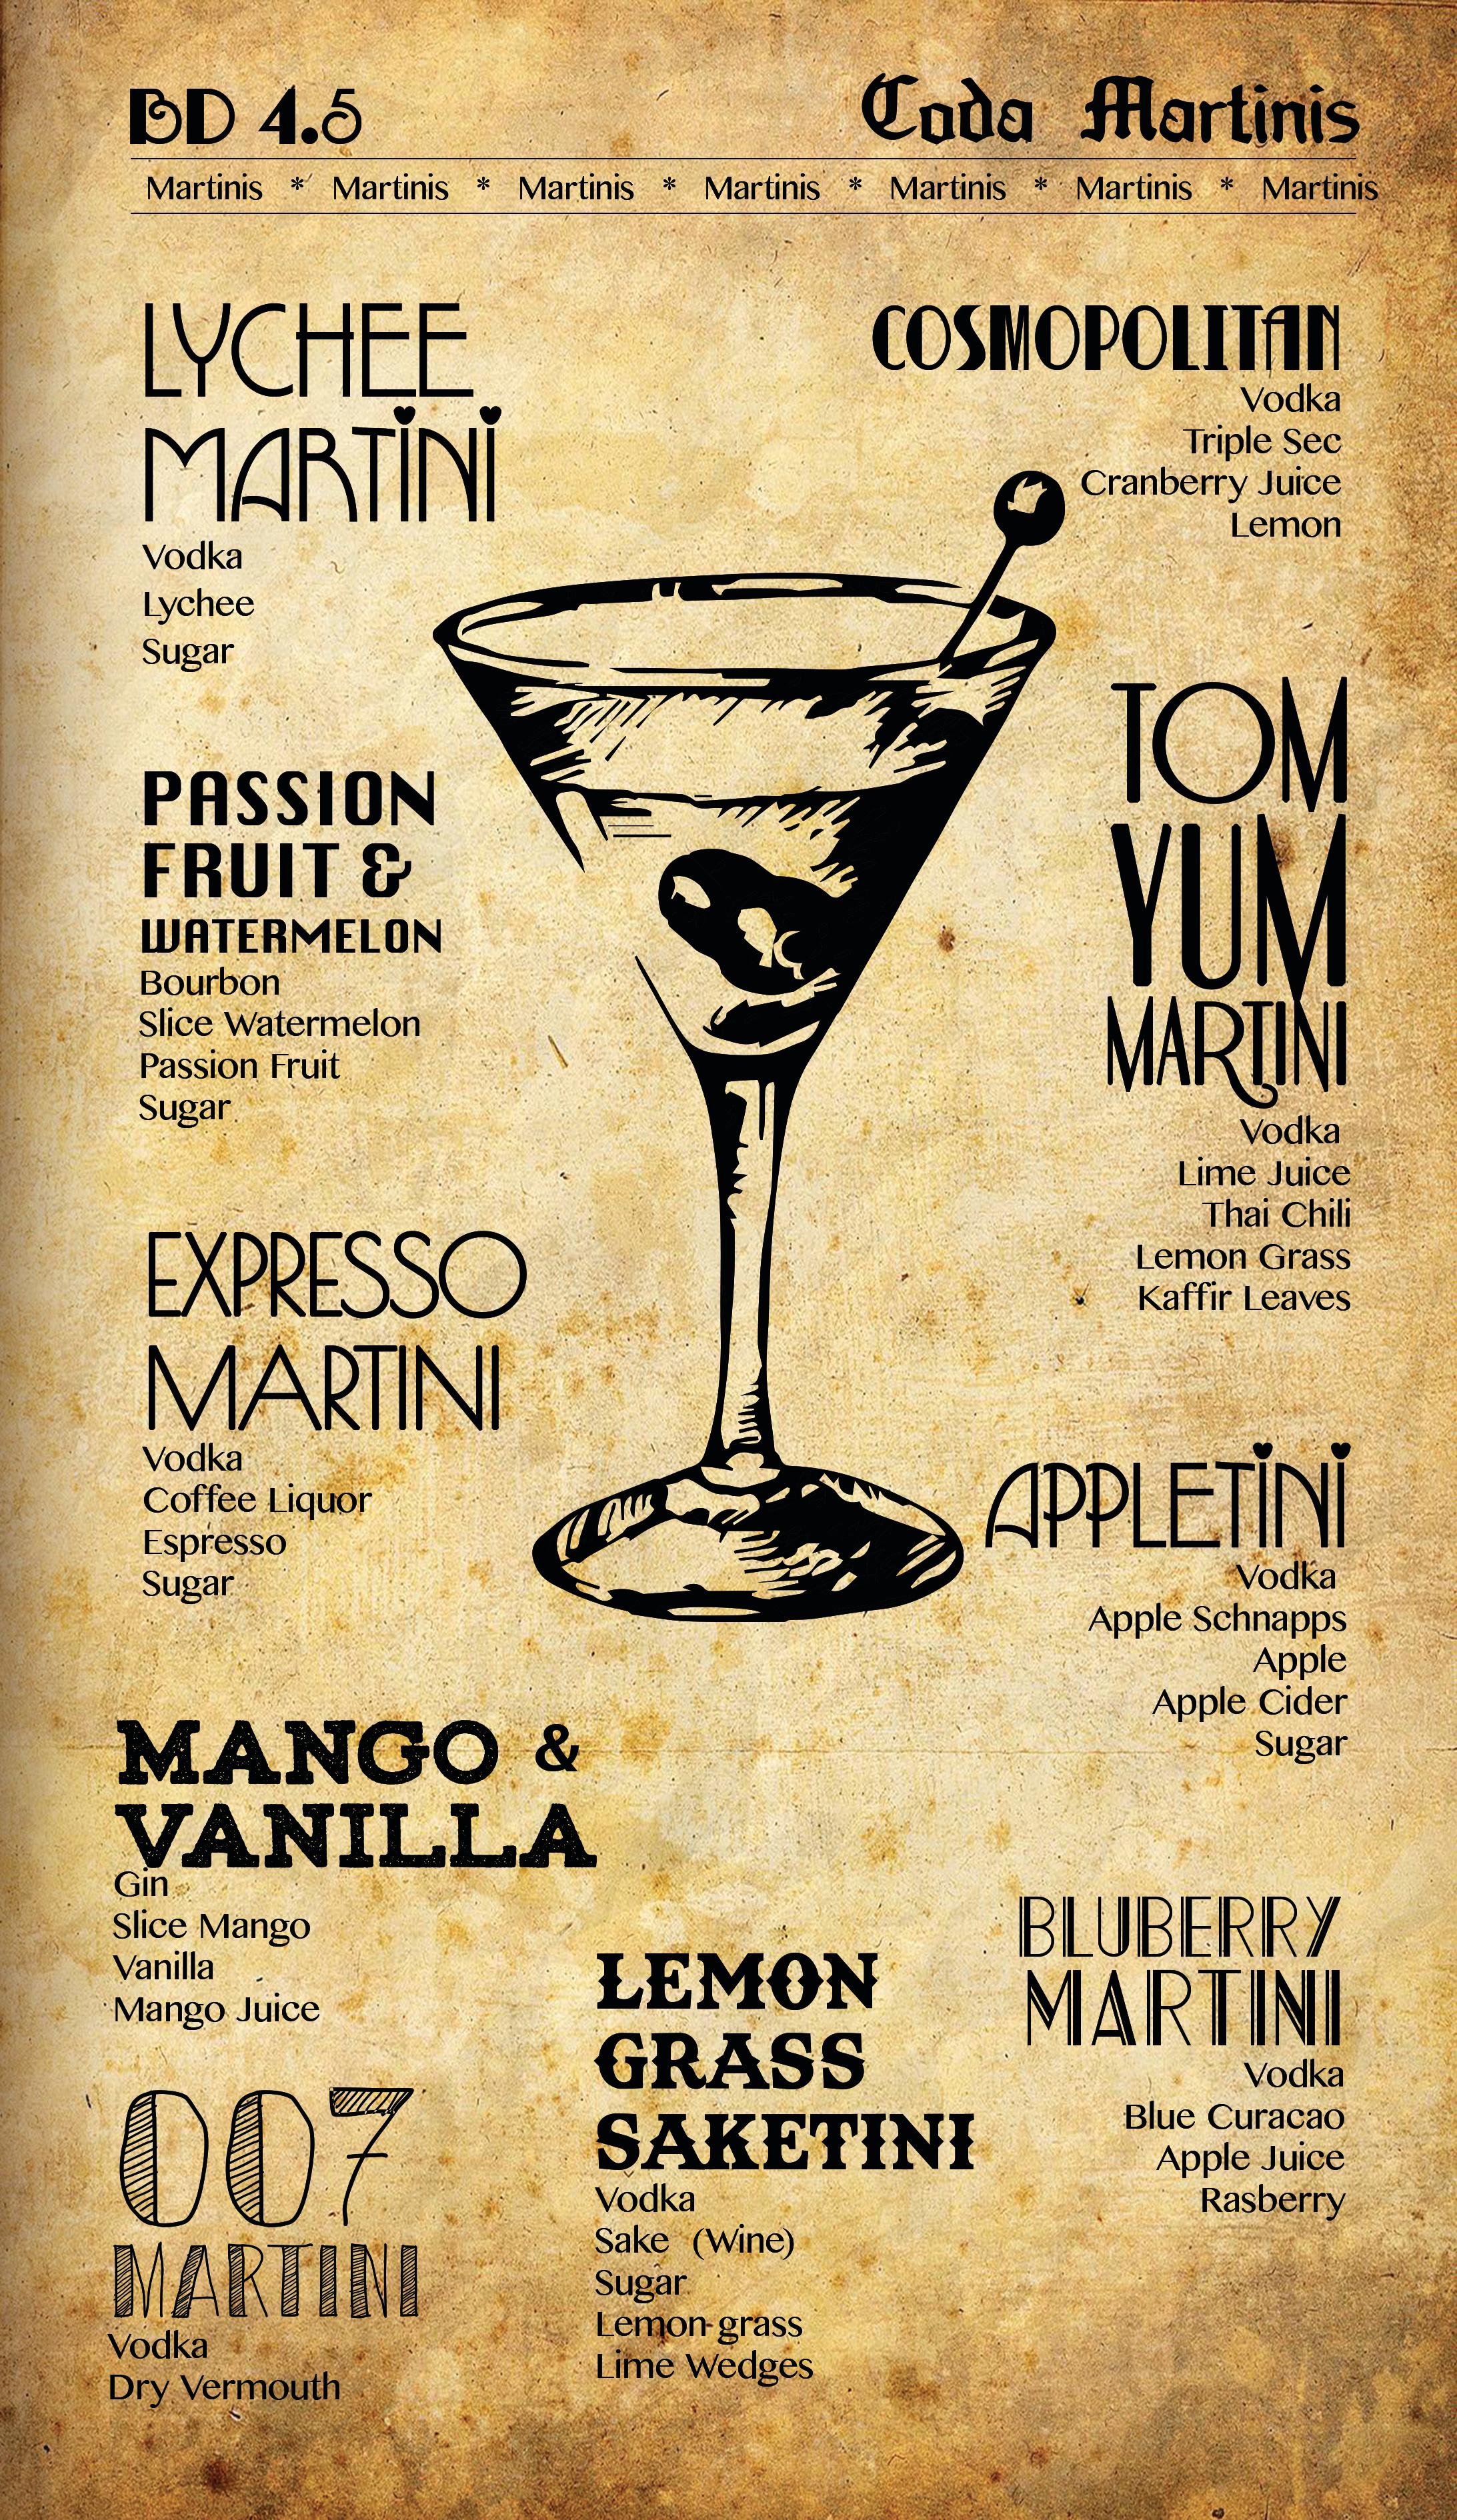 Coda Martinis